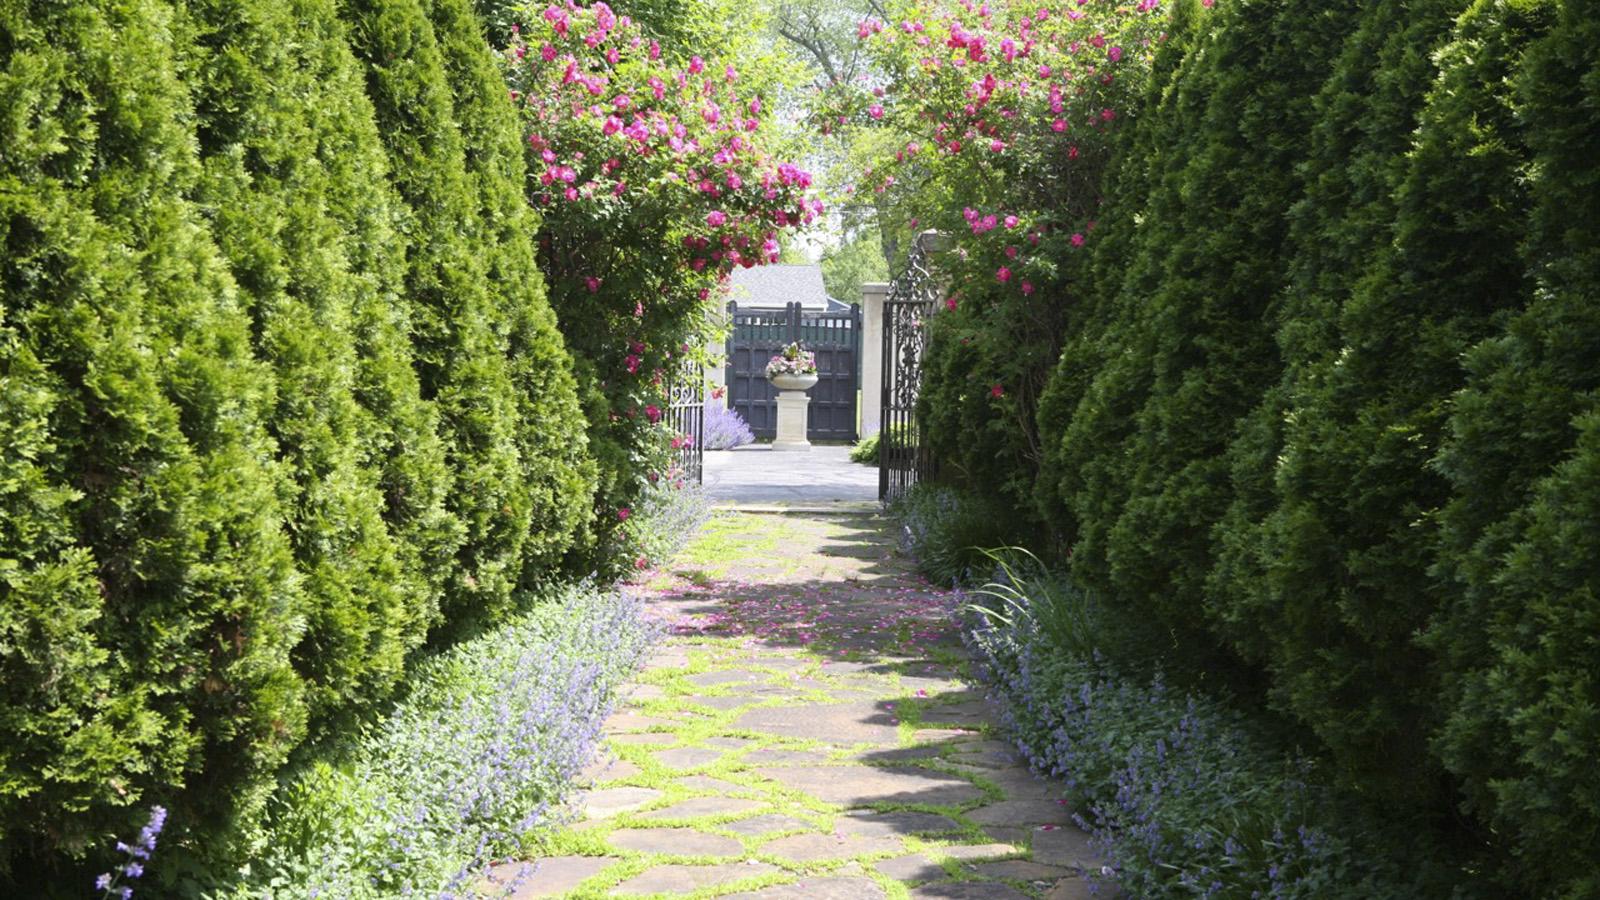 WI_Oshkosh_PaineArtCenter-Gardens_signature_DavidCalle_2015_01.jpg